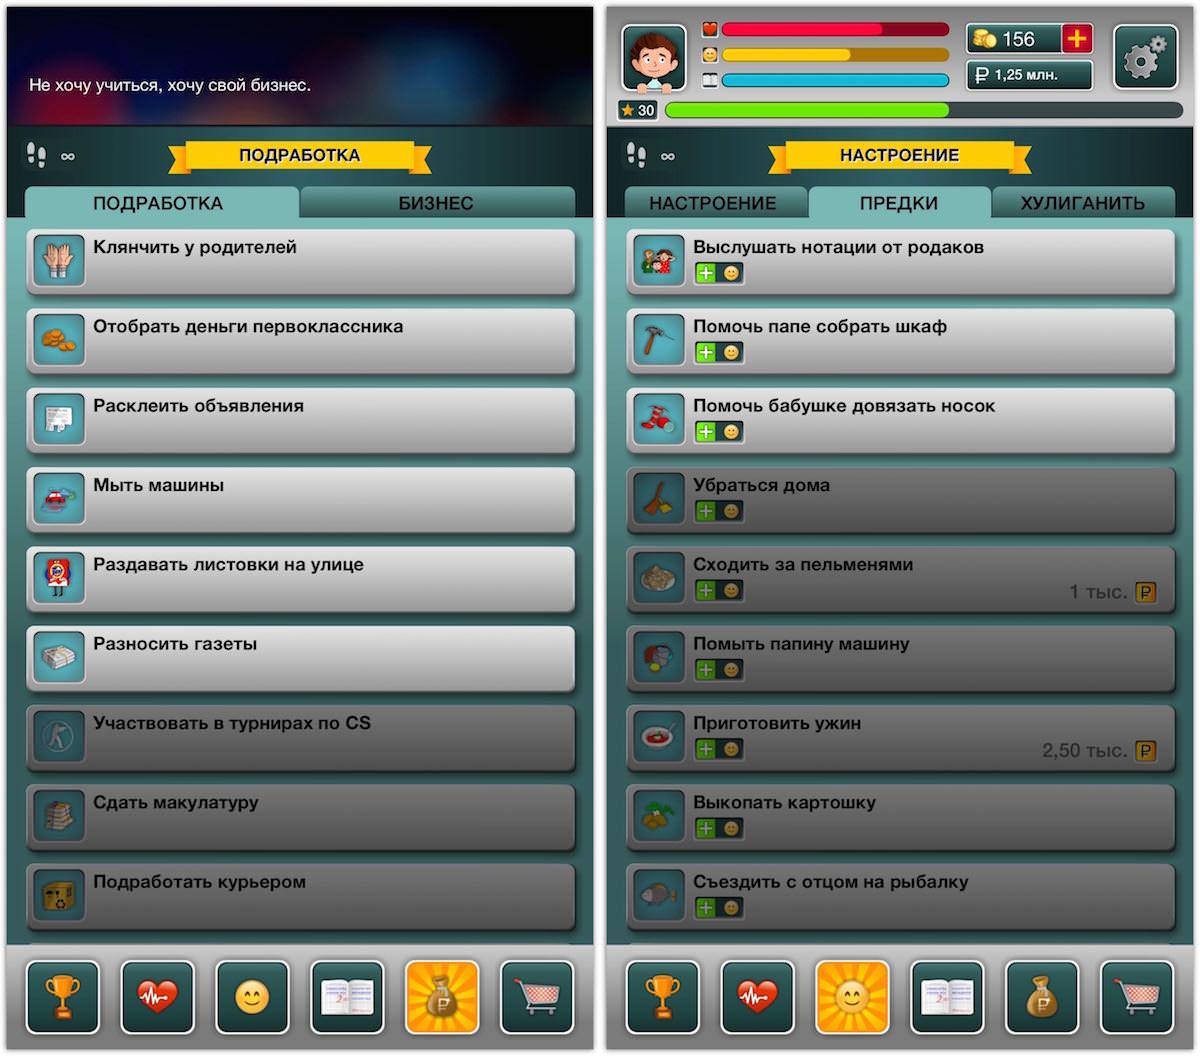 школьник симулятор Russia iOS iPhone iPad App Store 2